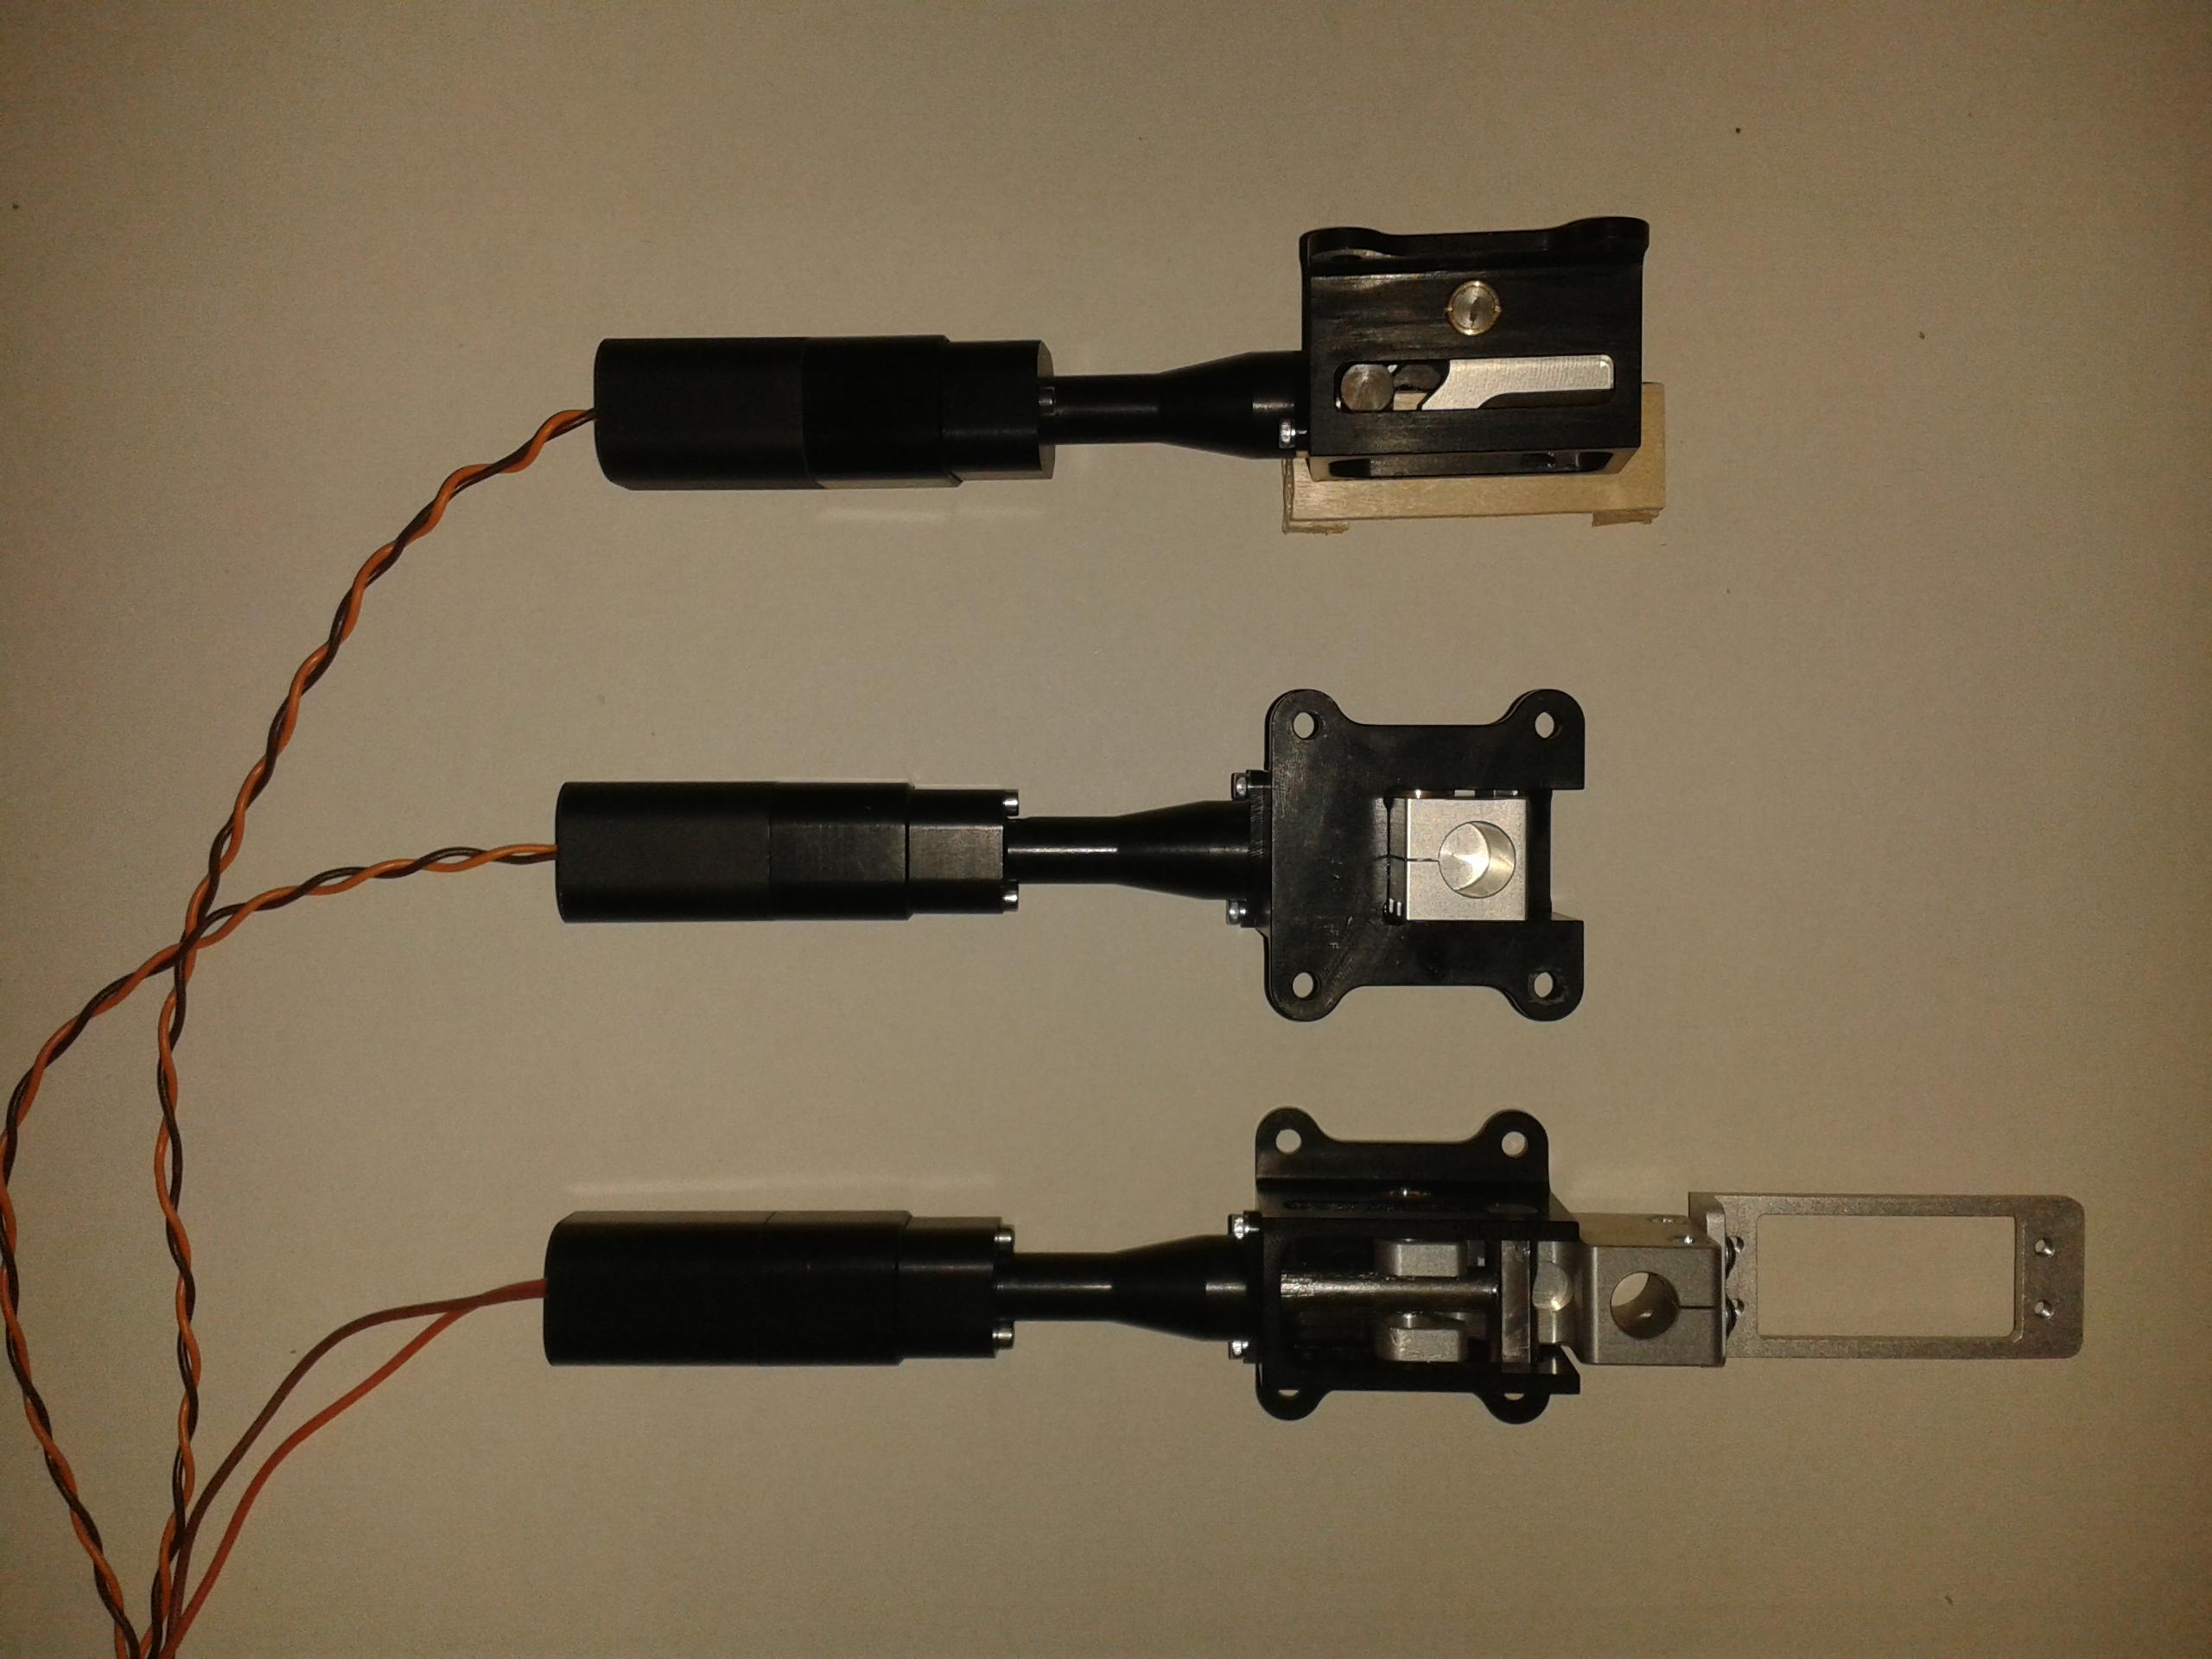 Sebart Avanti S Build Thread W Kt 180 Page 15 Rcu Forums How To Lengthen Electrical Wiresavi Youtube Best Regards